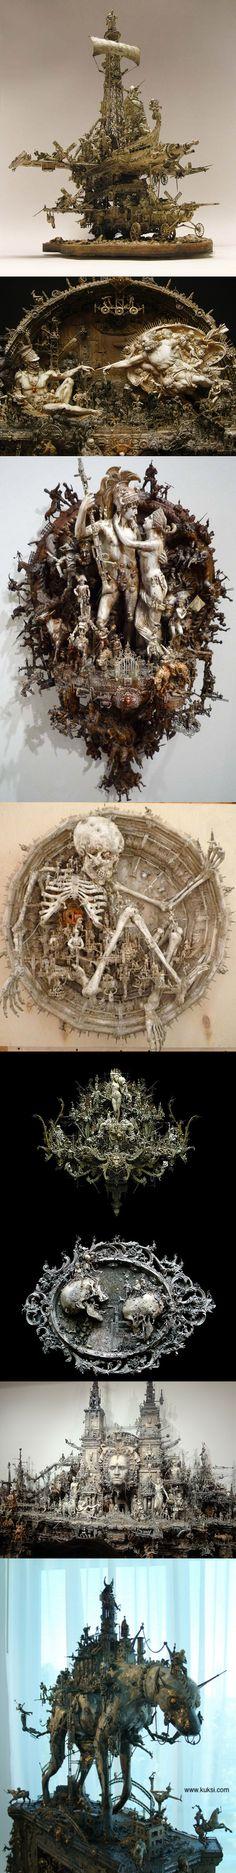 Fantasy | Whimsical | Strange | Mythical | Creative | Creatures | Dolls | Sculptures | Kris Kuksi